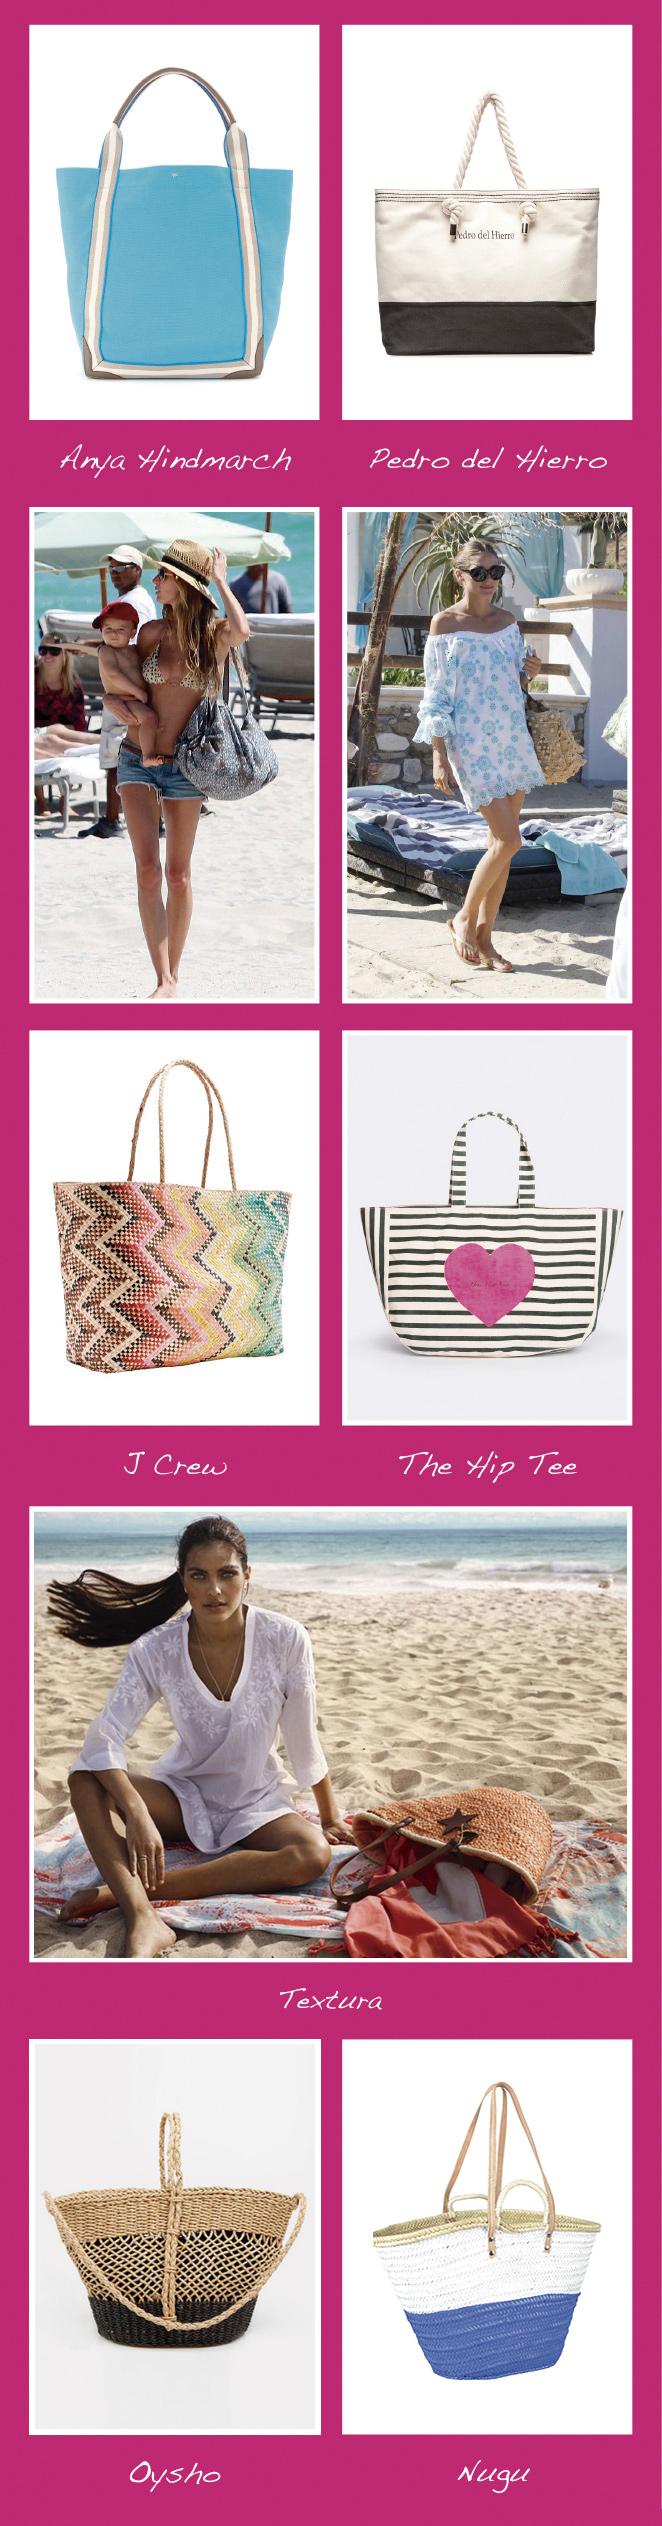 Bolsas de playa para este verano 2014